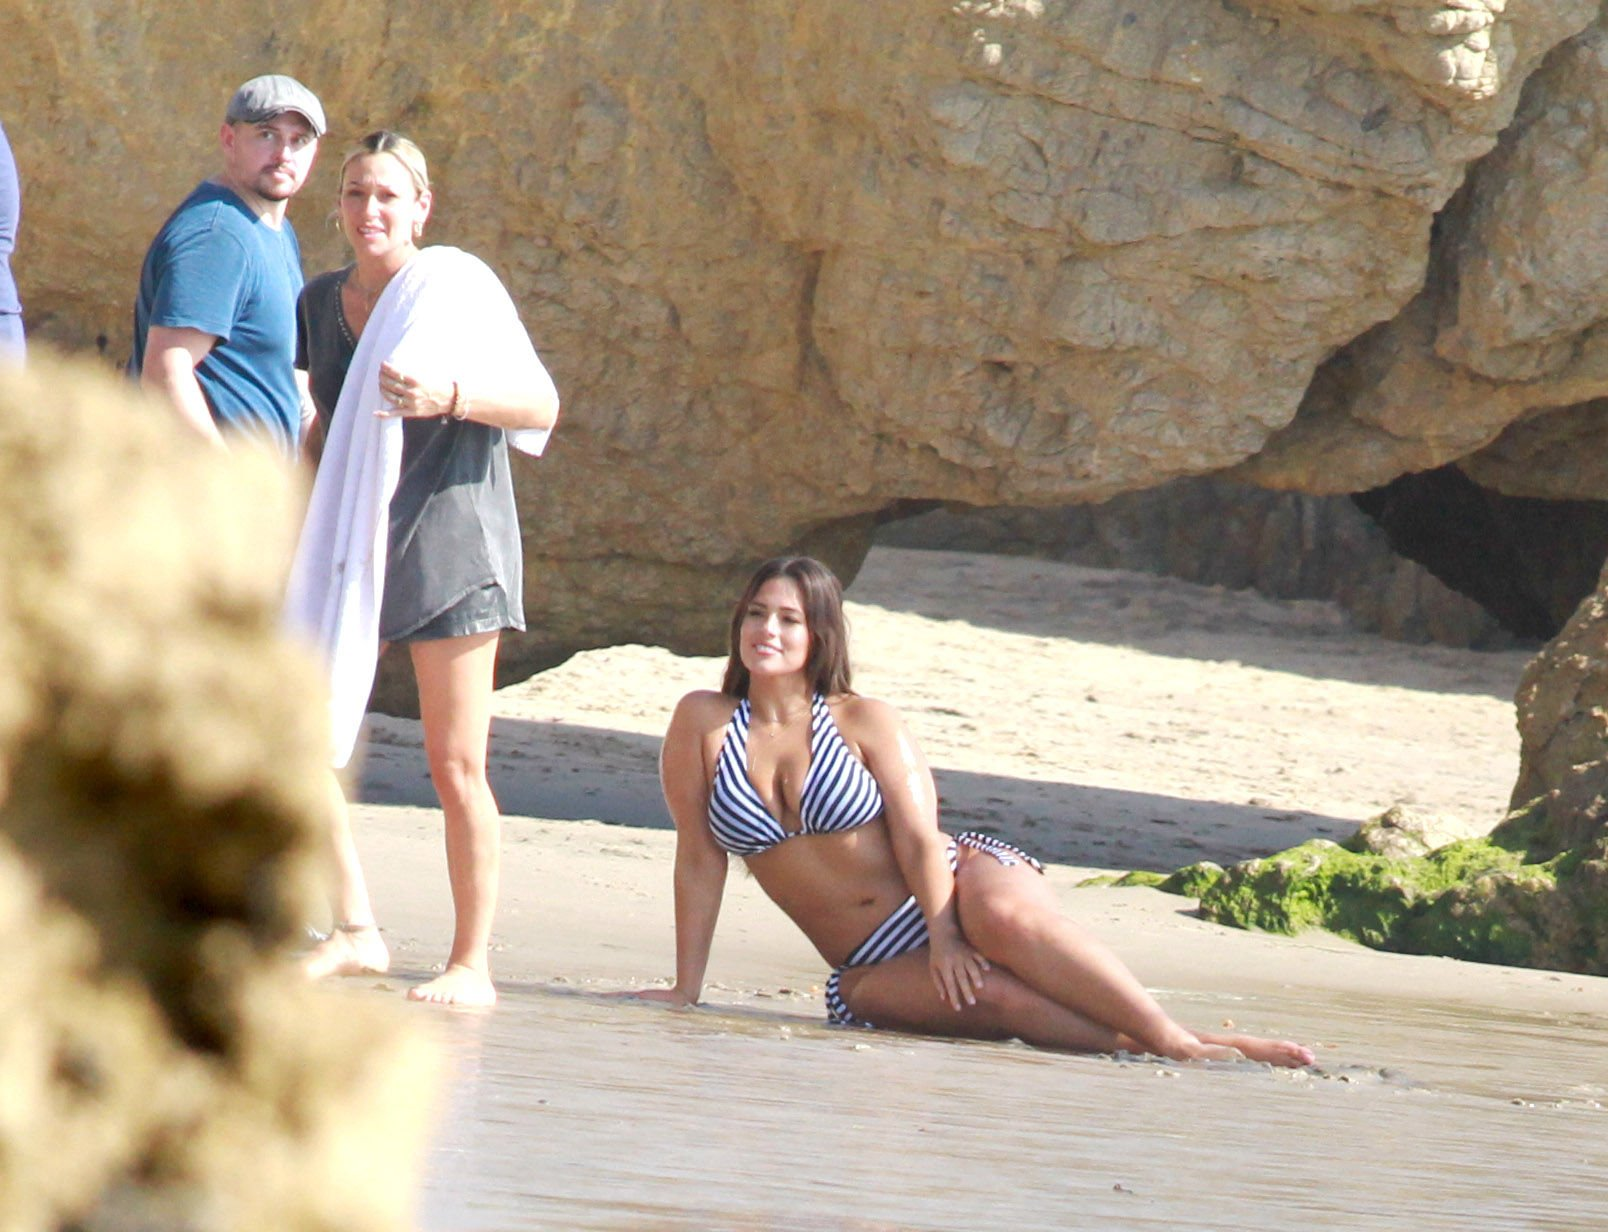 Ashley-Graham-Sexy-TheFappeningBlog.com-21.jpg